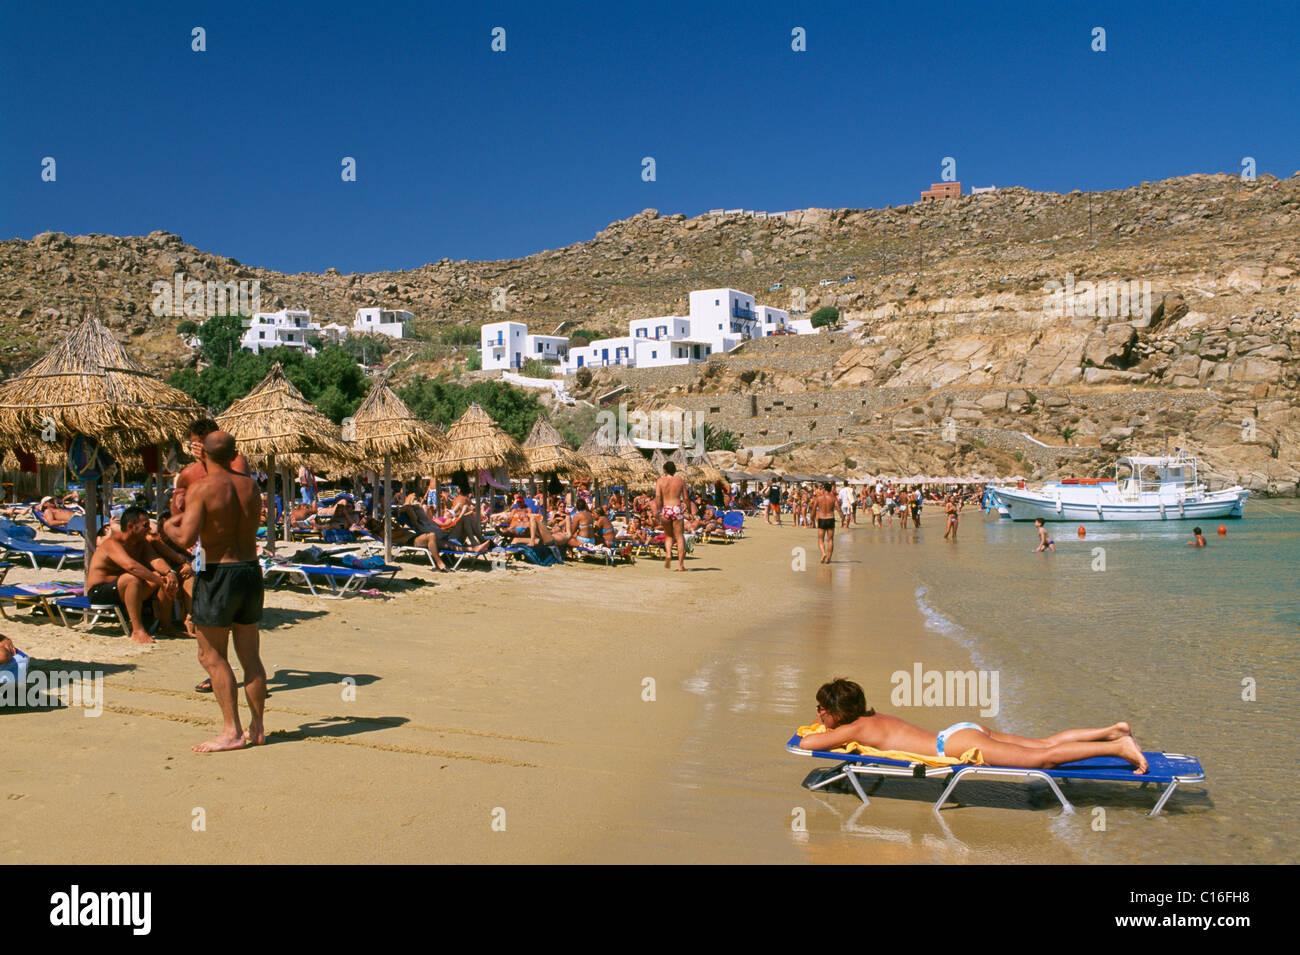 Best Island Beaches For Partying Mykonos St Barts: Super Paradise Beach, Mykonos, Cyclades, Greece, Europe